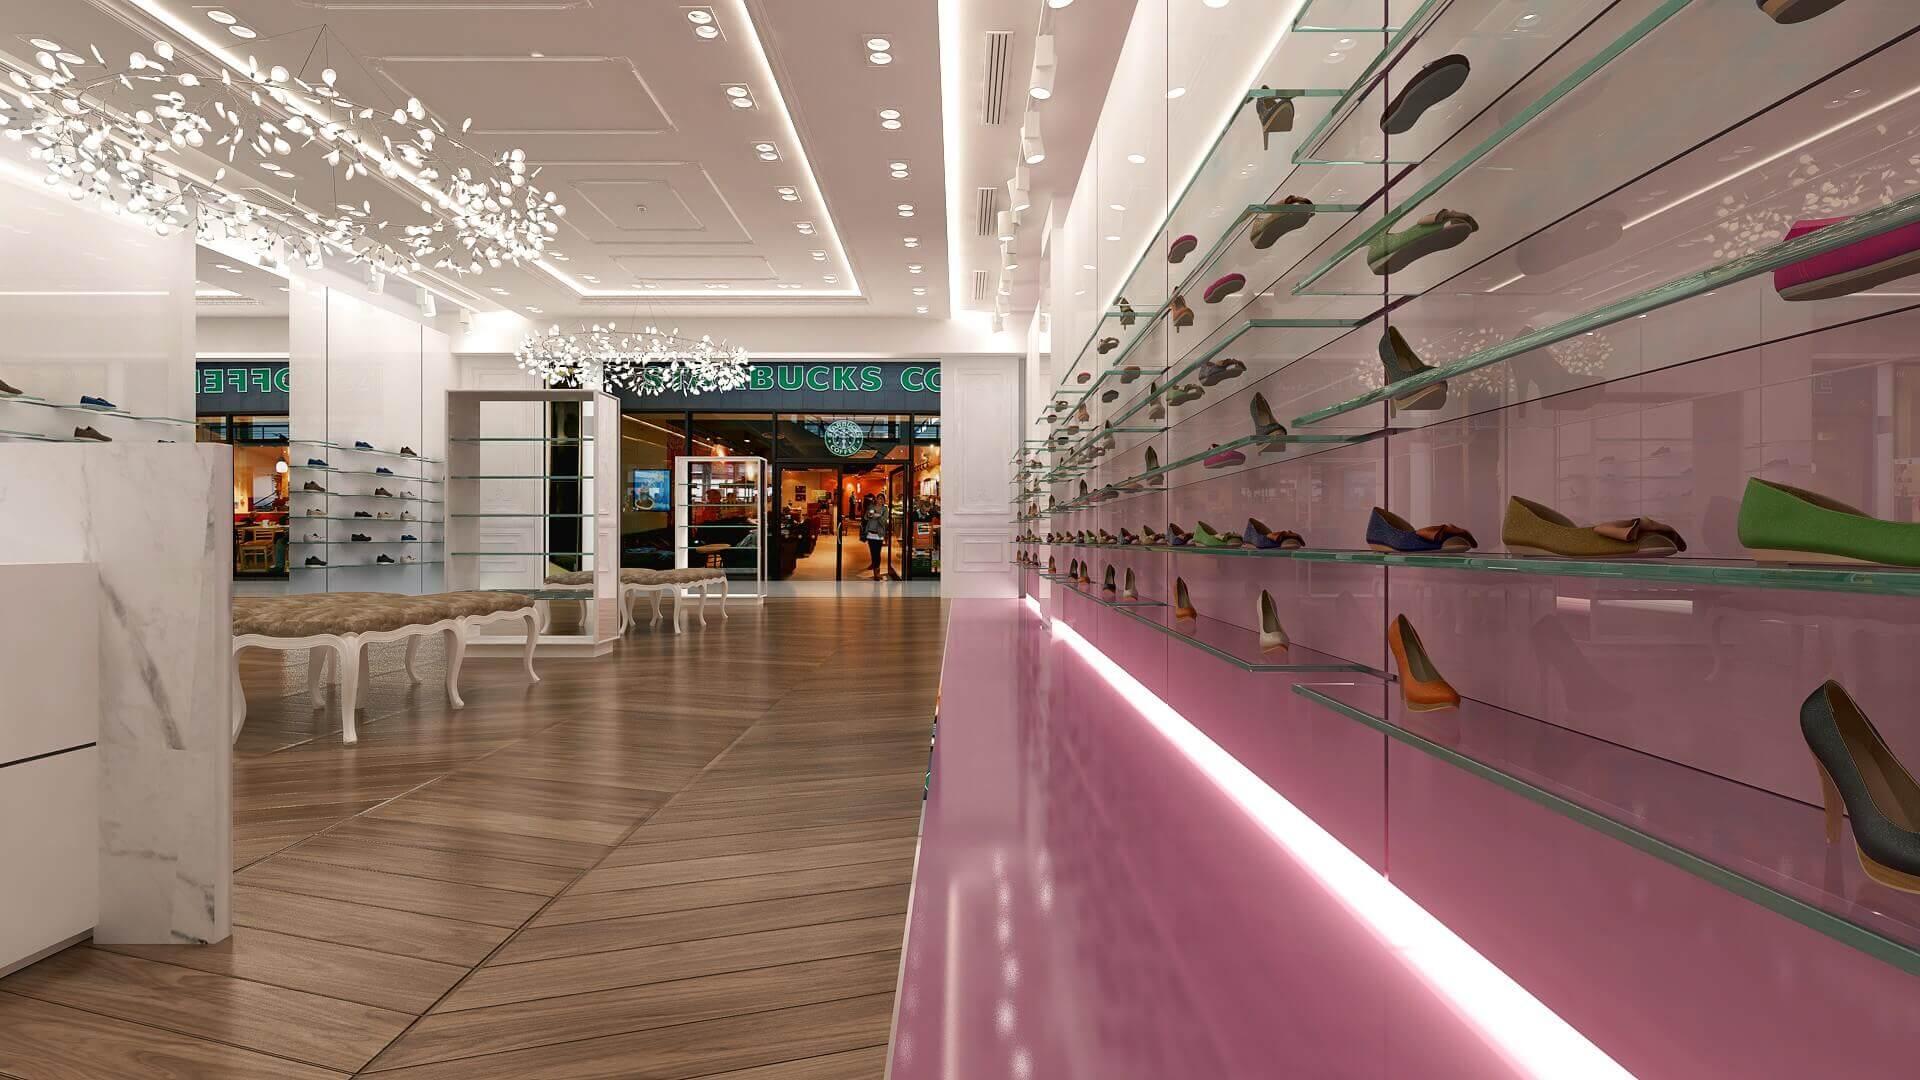 Shop design 2021 Deriden Concept Retail